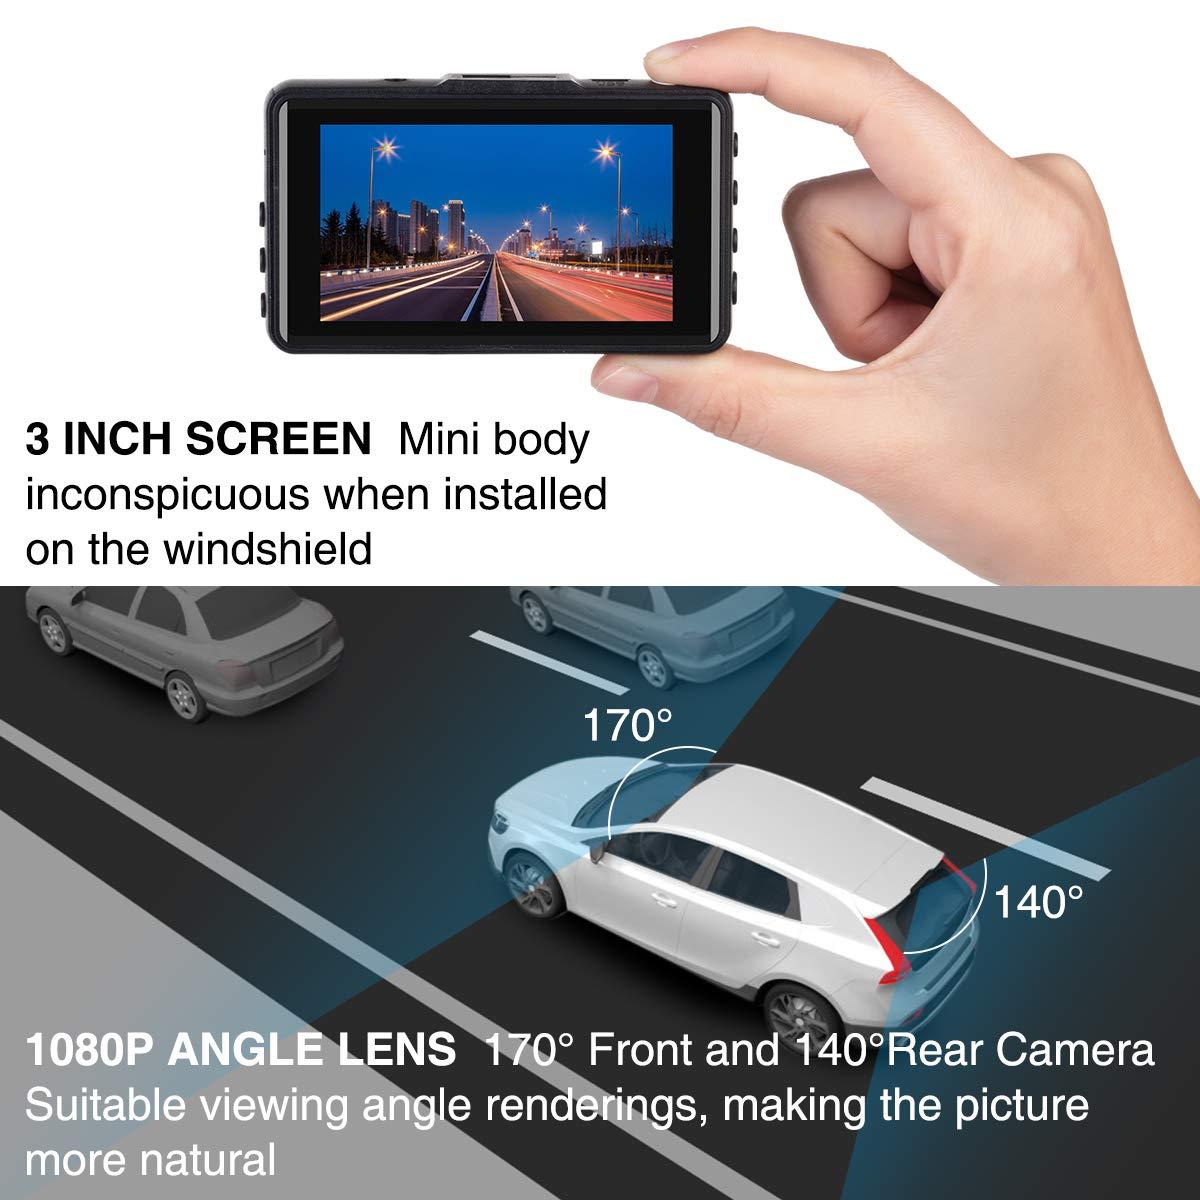 SSONTONG Dash Cam Front and Rear 1080P Full HD Dual Dash Camera 170 Wide Angle 3 Inch IPS Screen Car Camera Reversing Camera with Night Vision G-Sensor Parking Monitor Loop Recording WDR